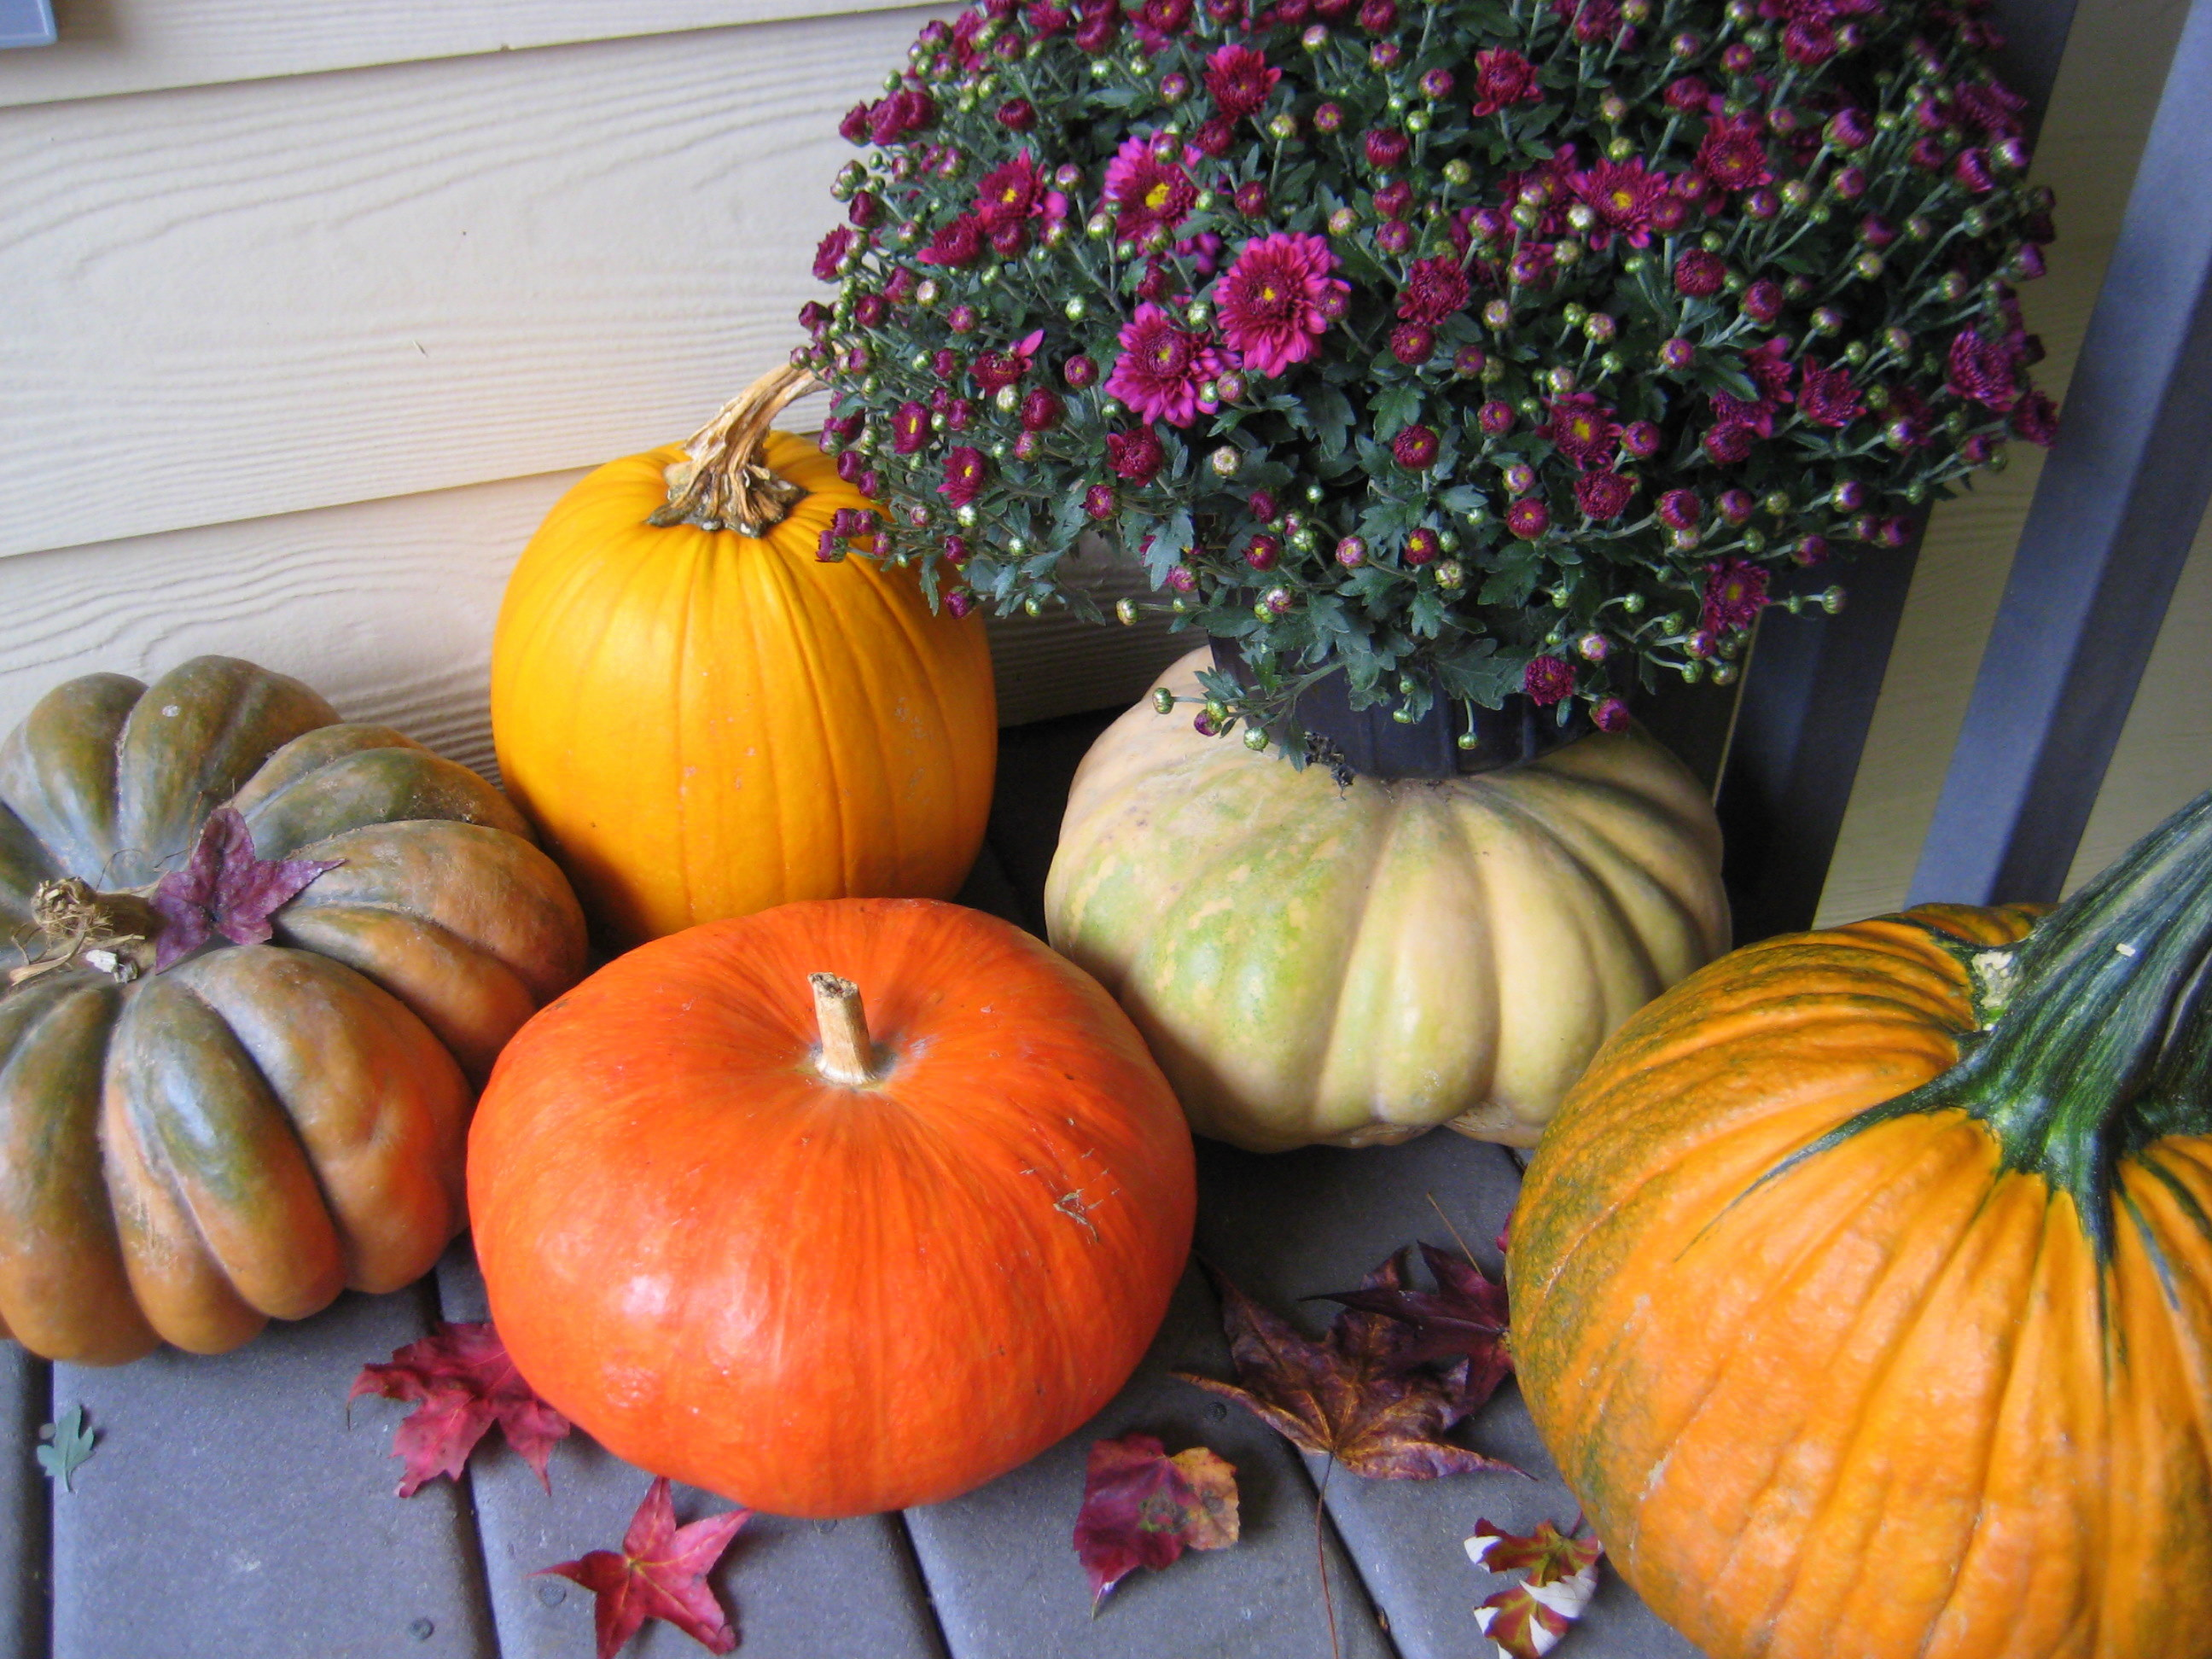 My fall doorstep decor!